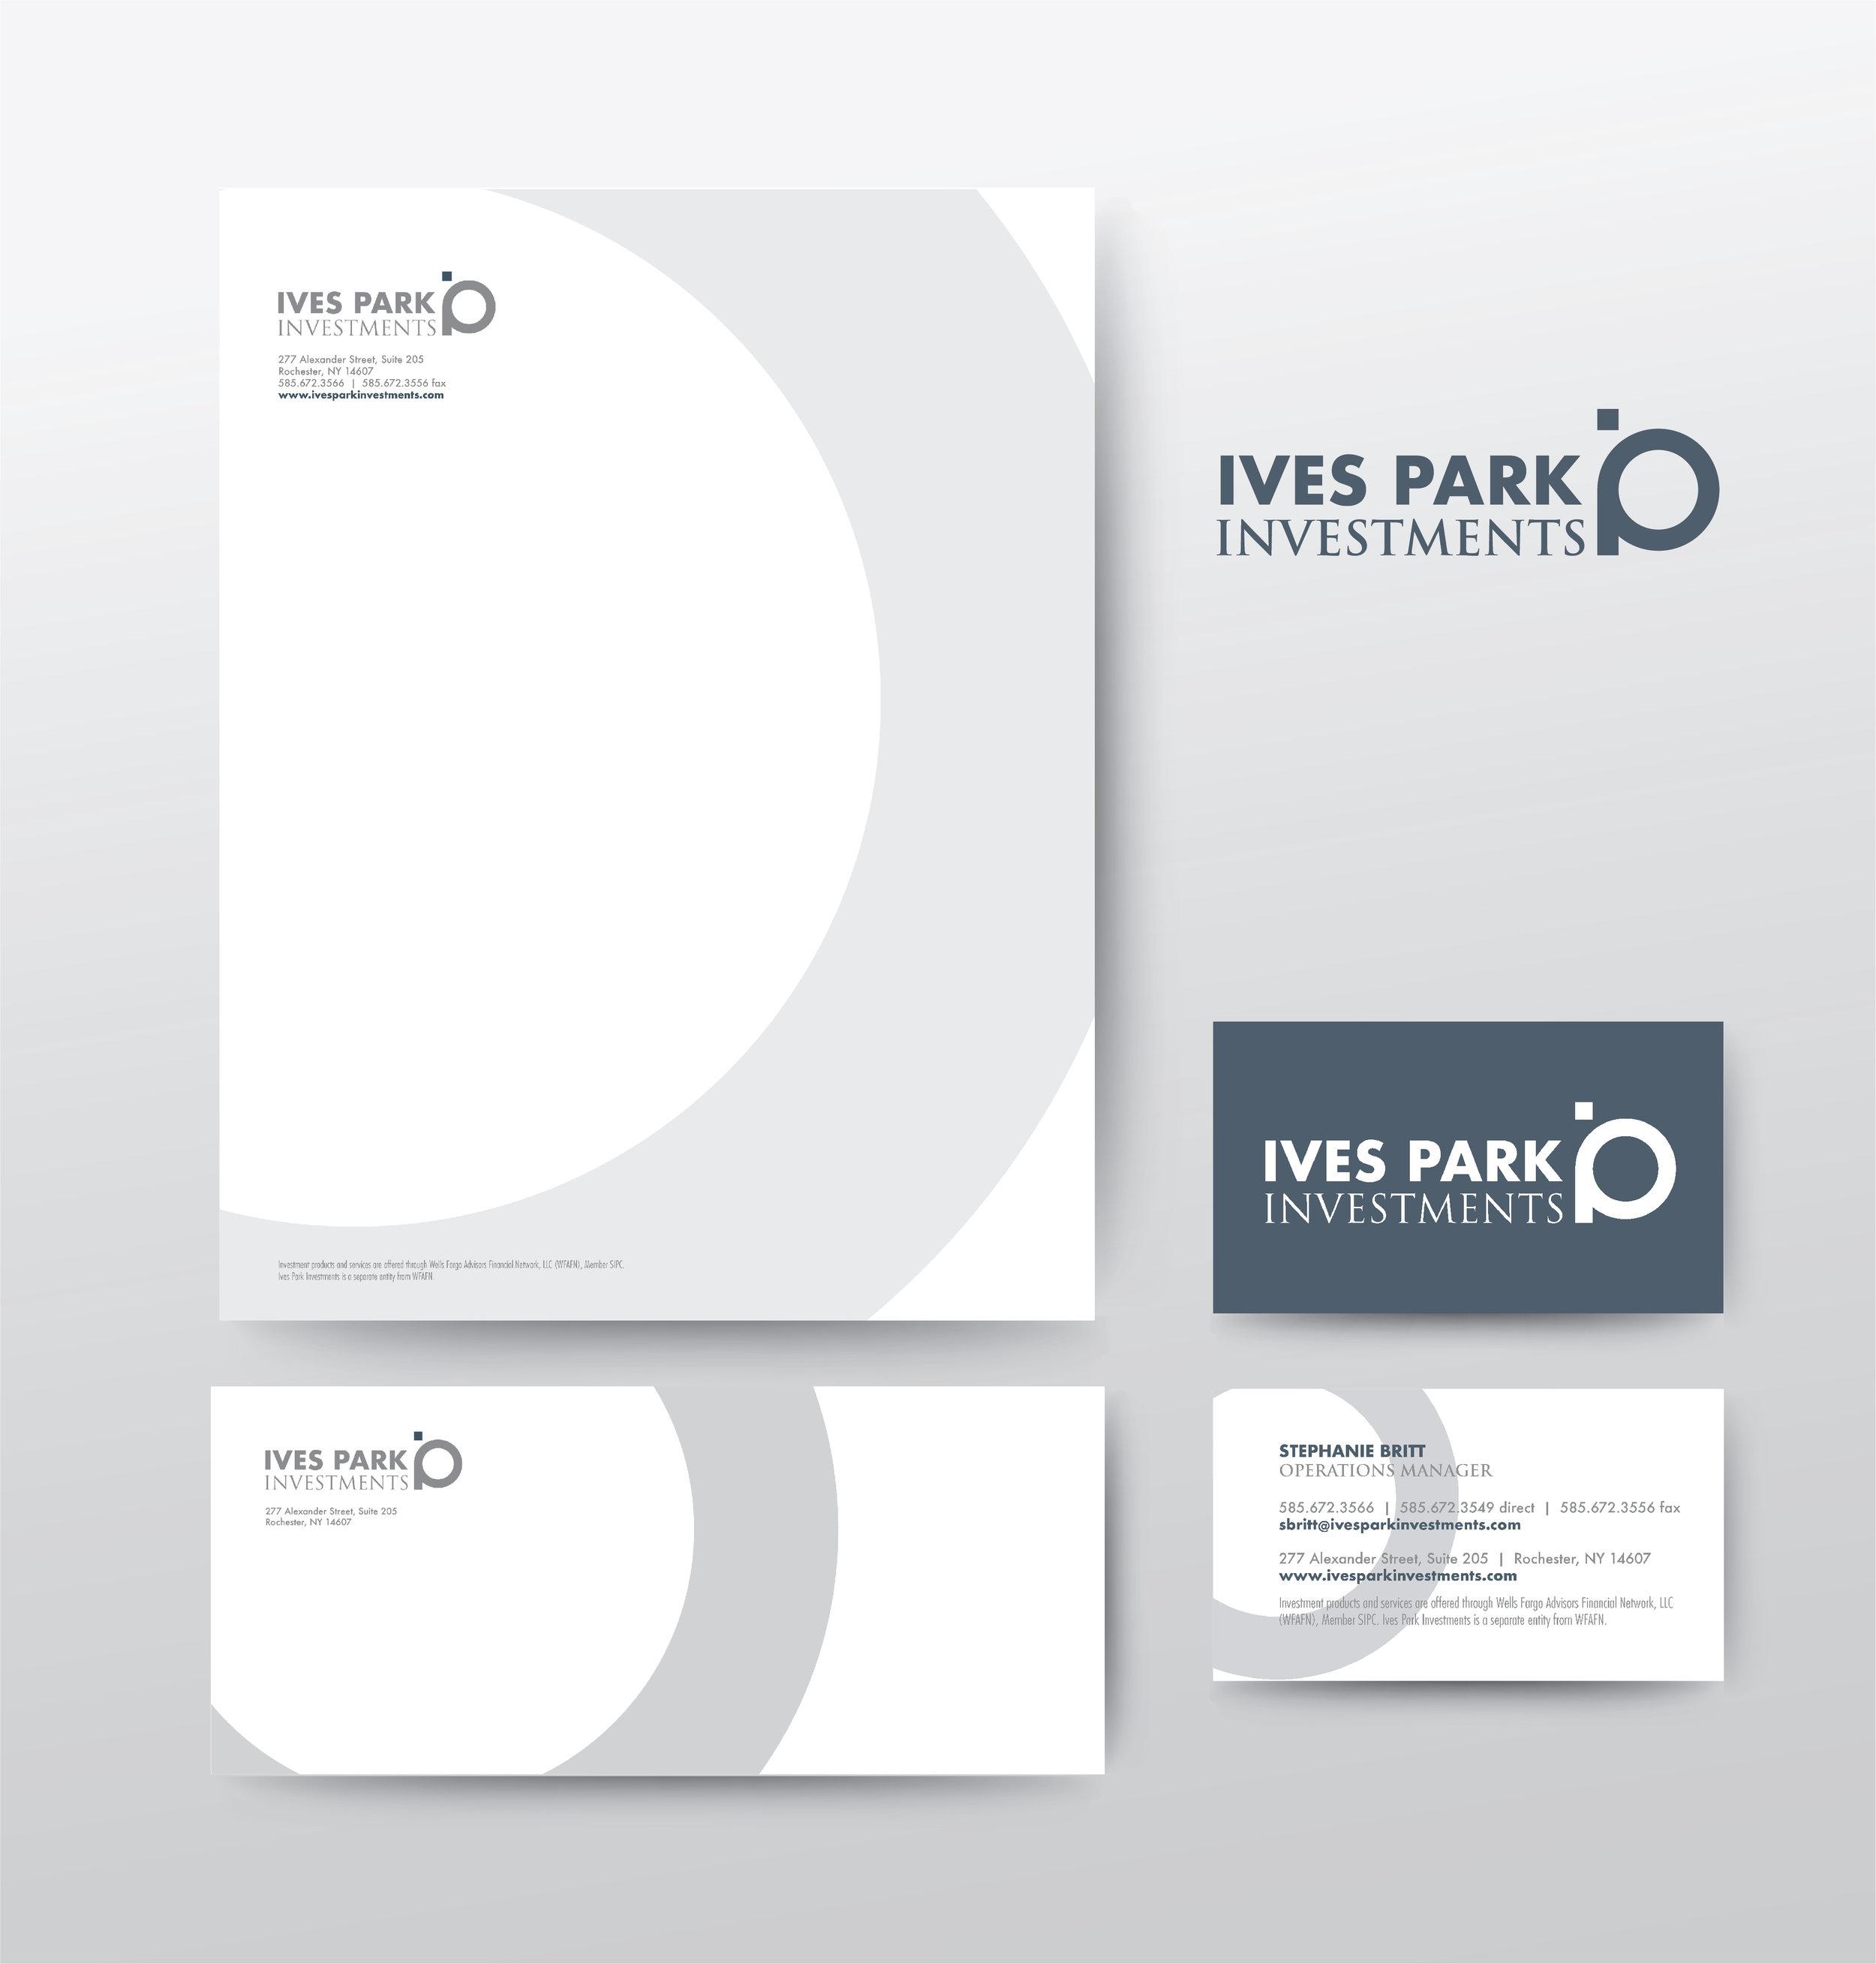 Ives Park Mockup-01.jpg